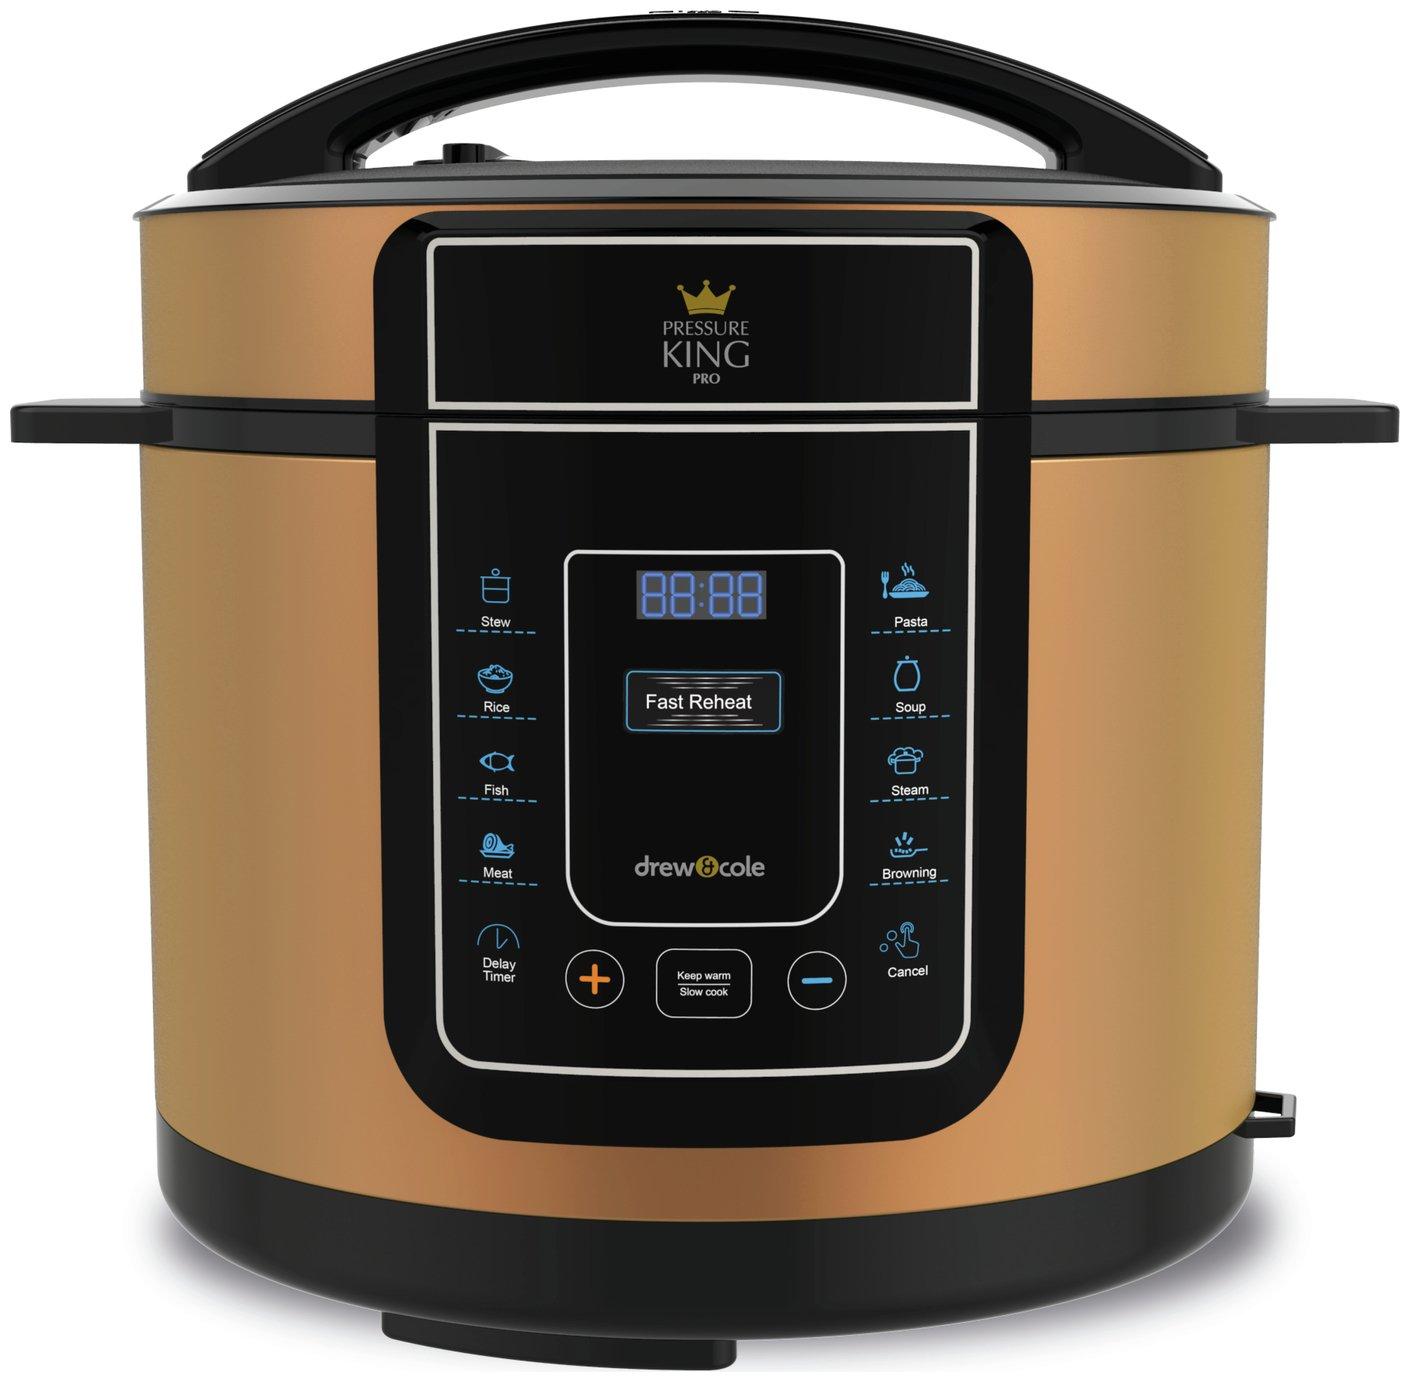 Image of Pressure King Pro - Copper - Pressure Cooker